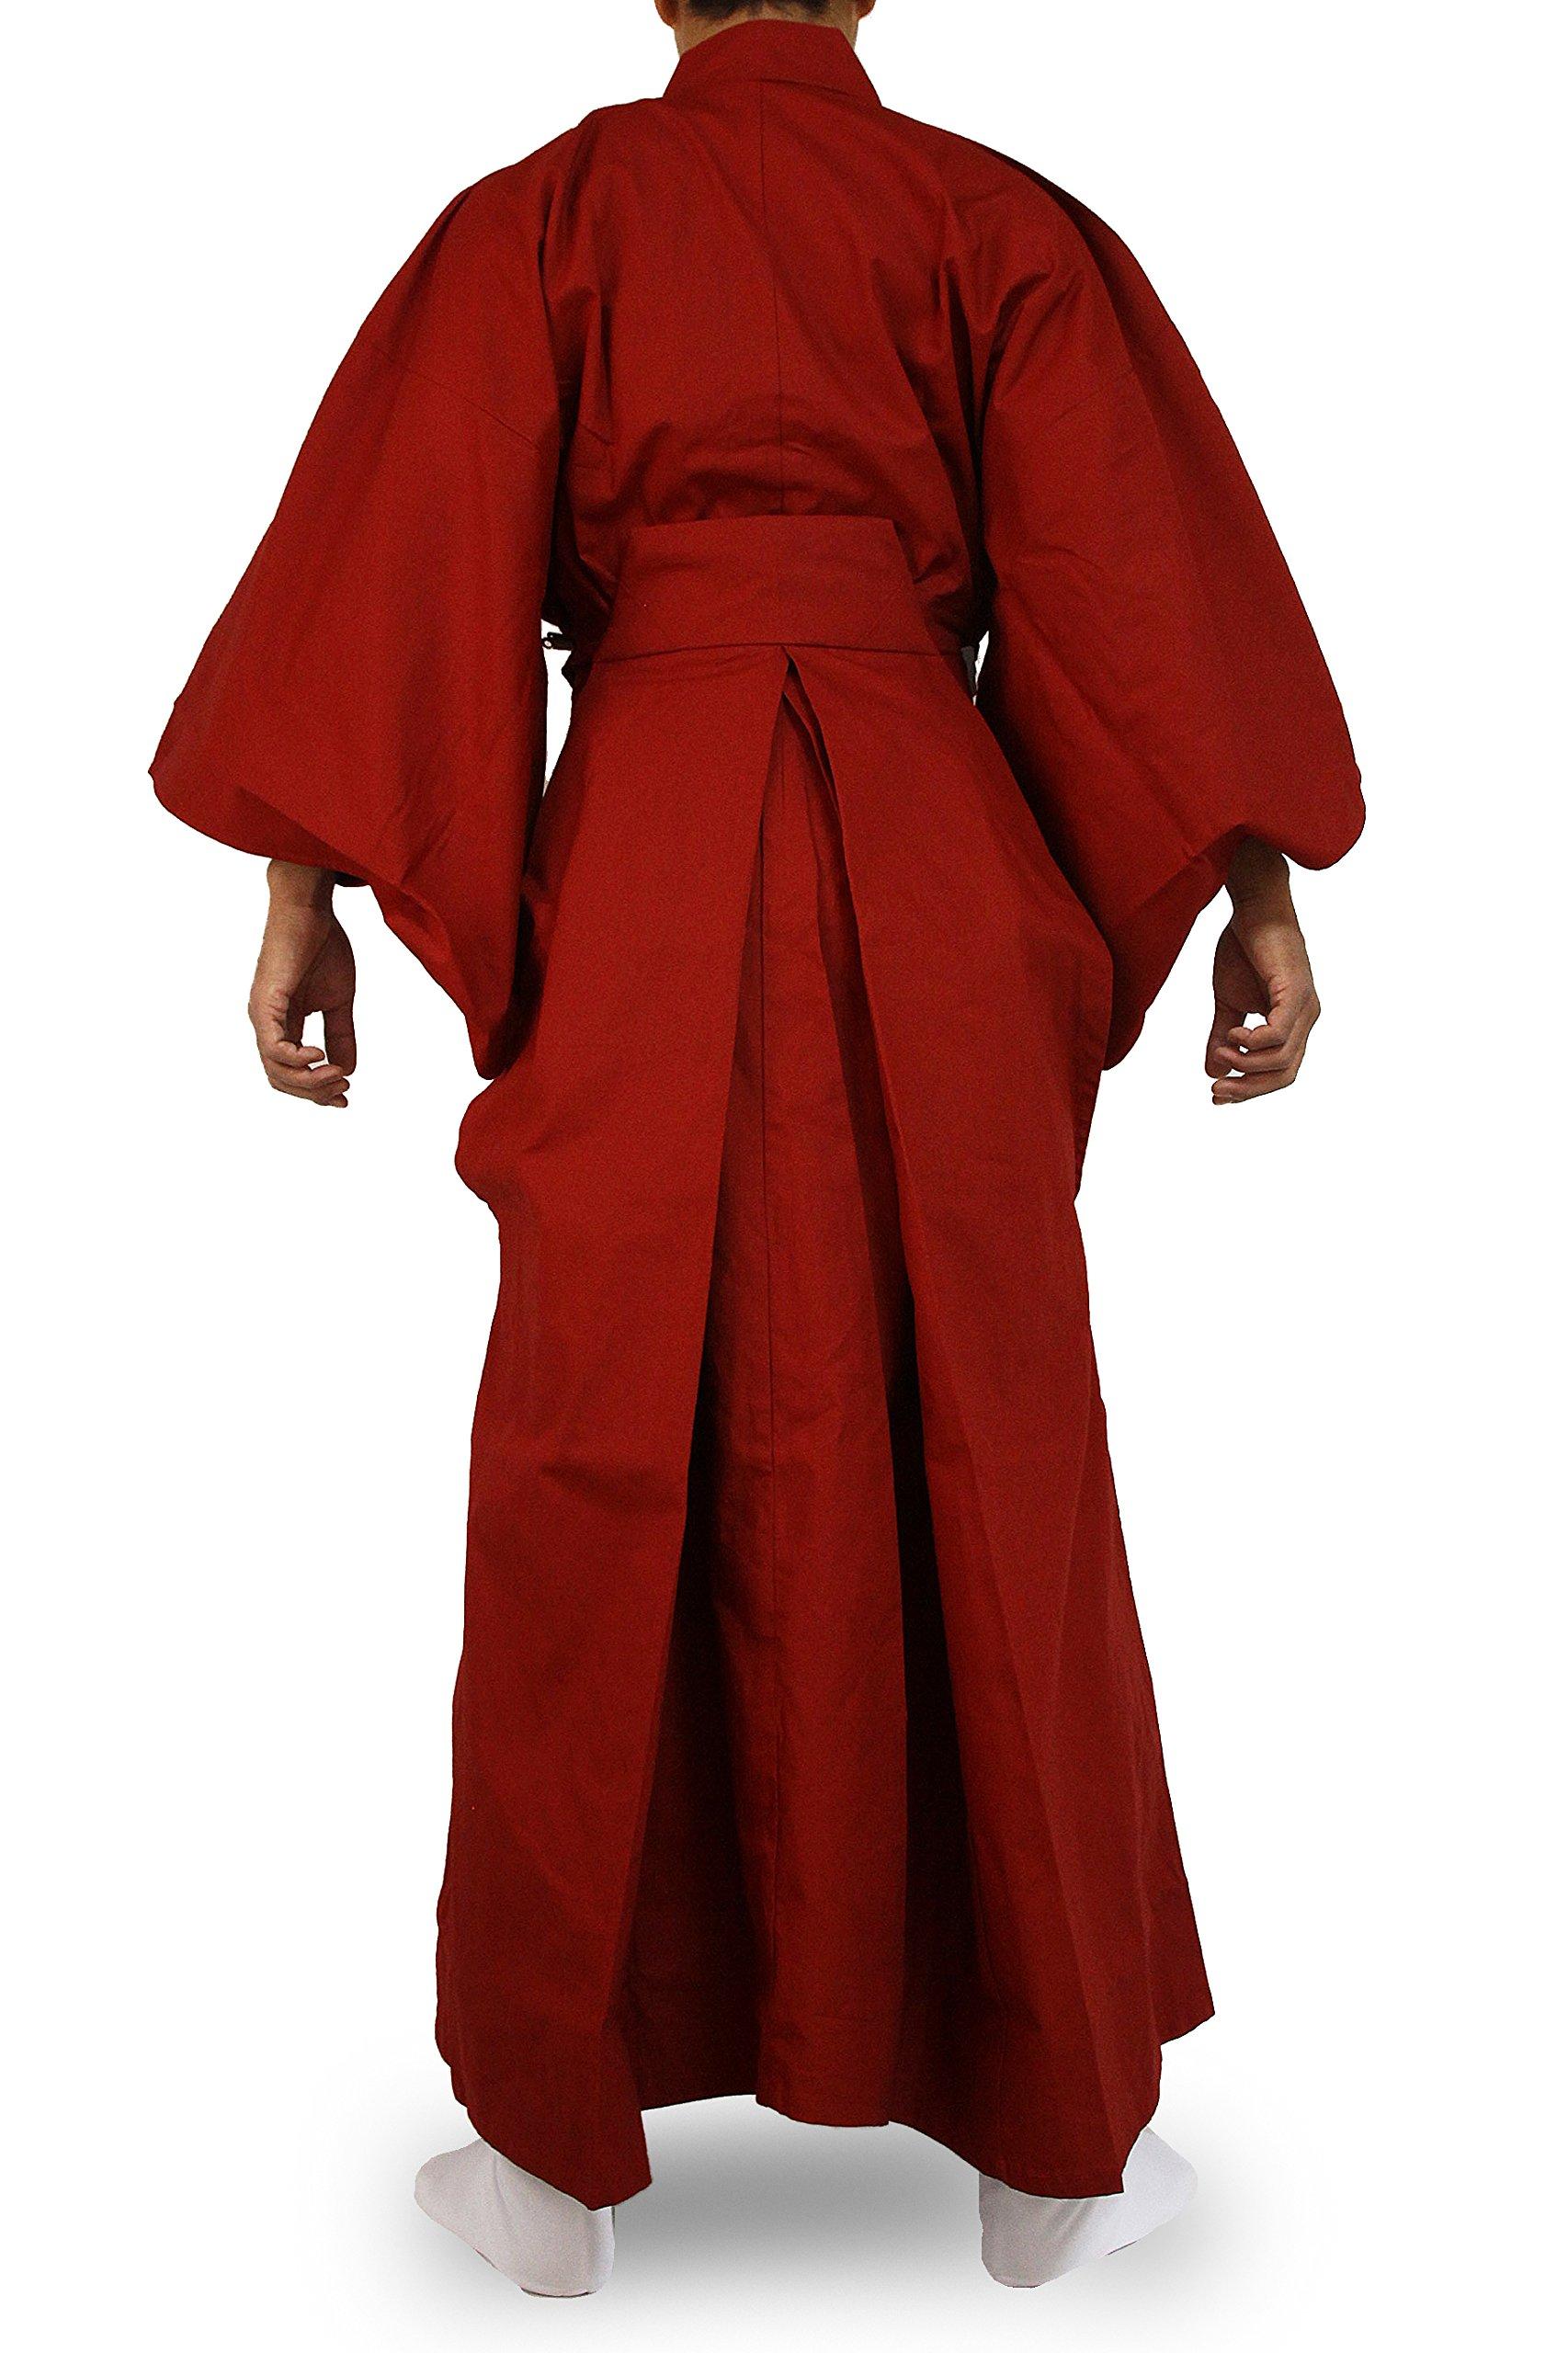 Edoten Japanese Samurai Hakama Uniform RD-RD L by Edoten (Image #4)